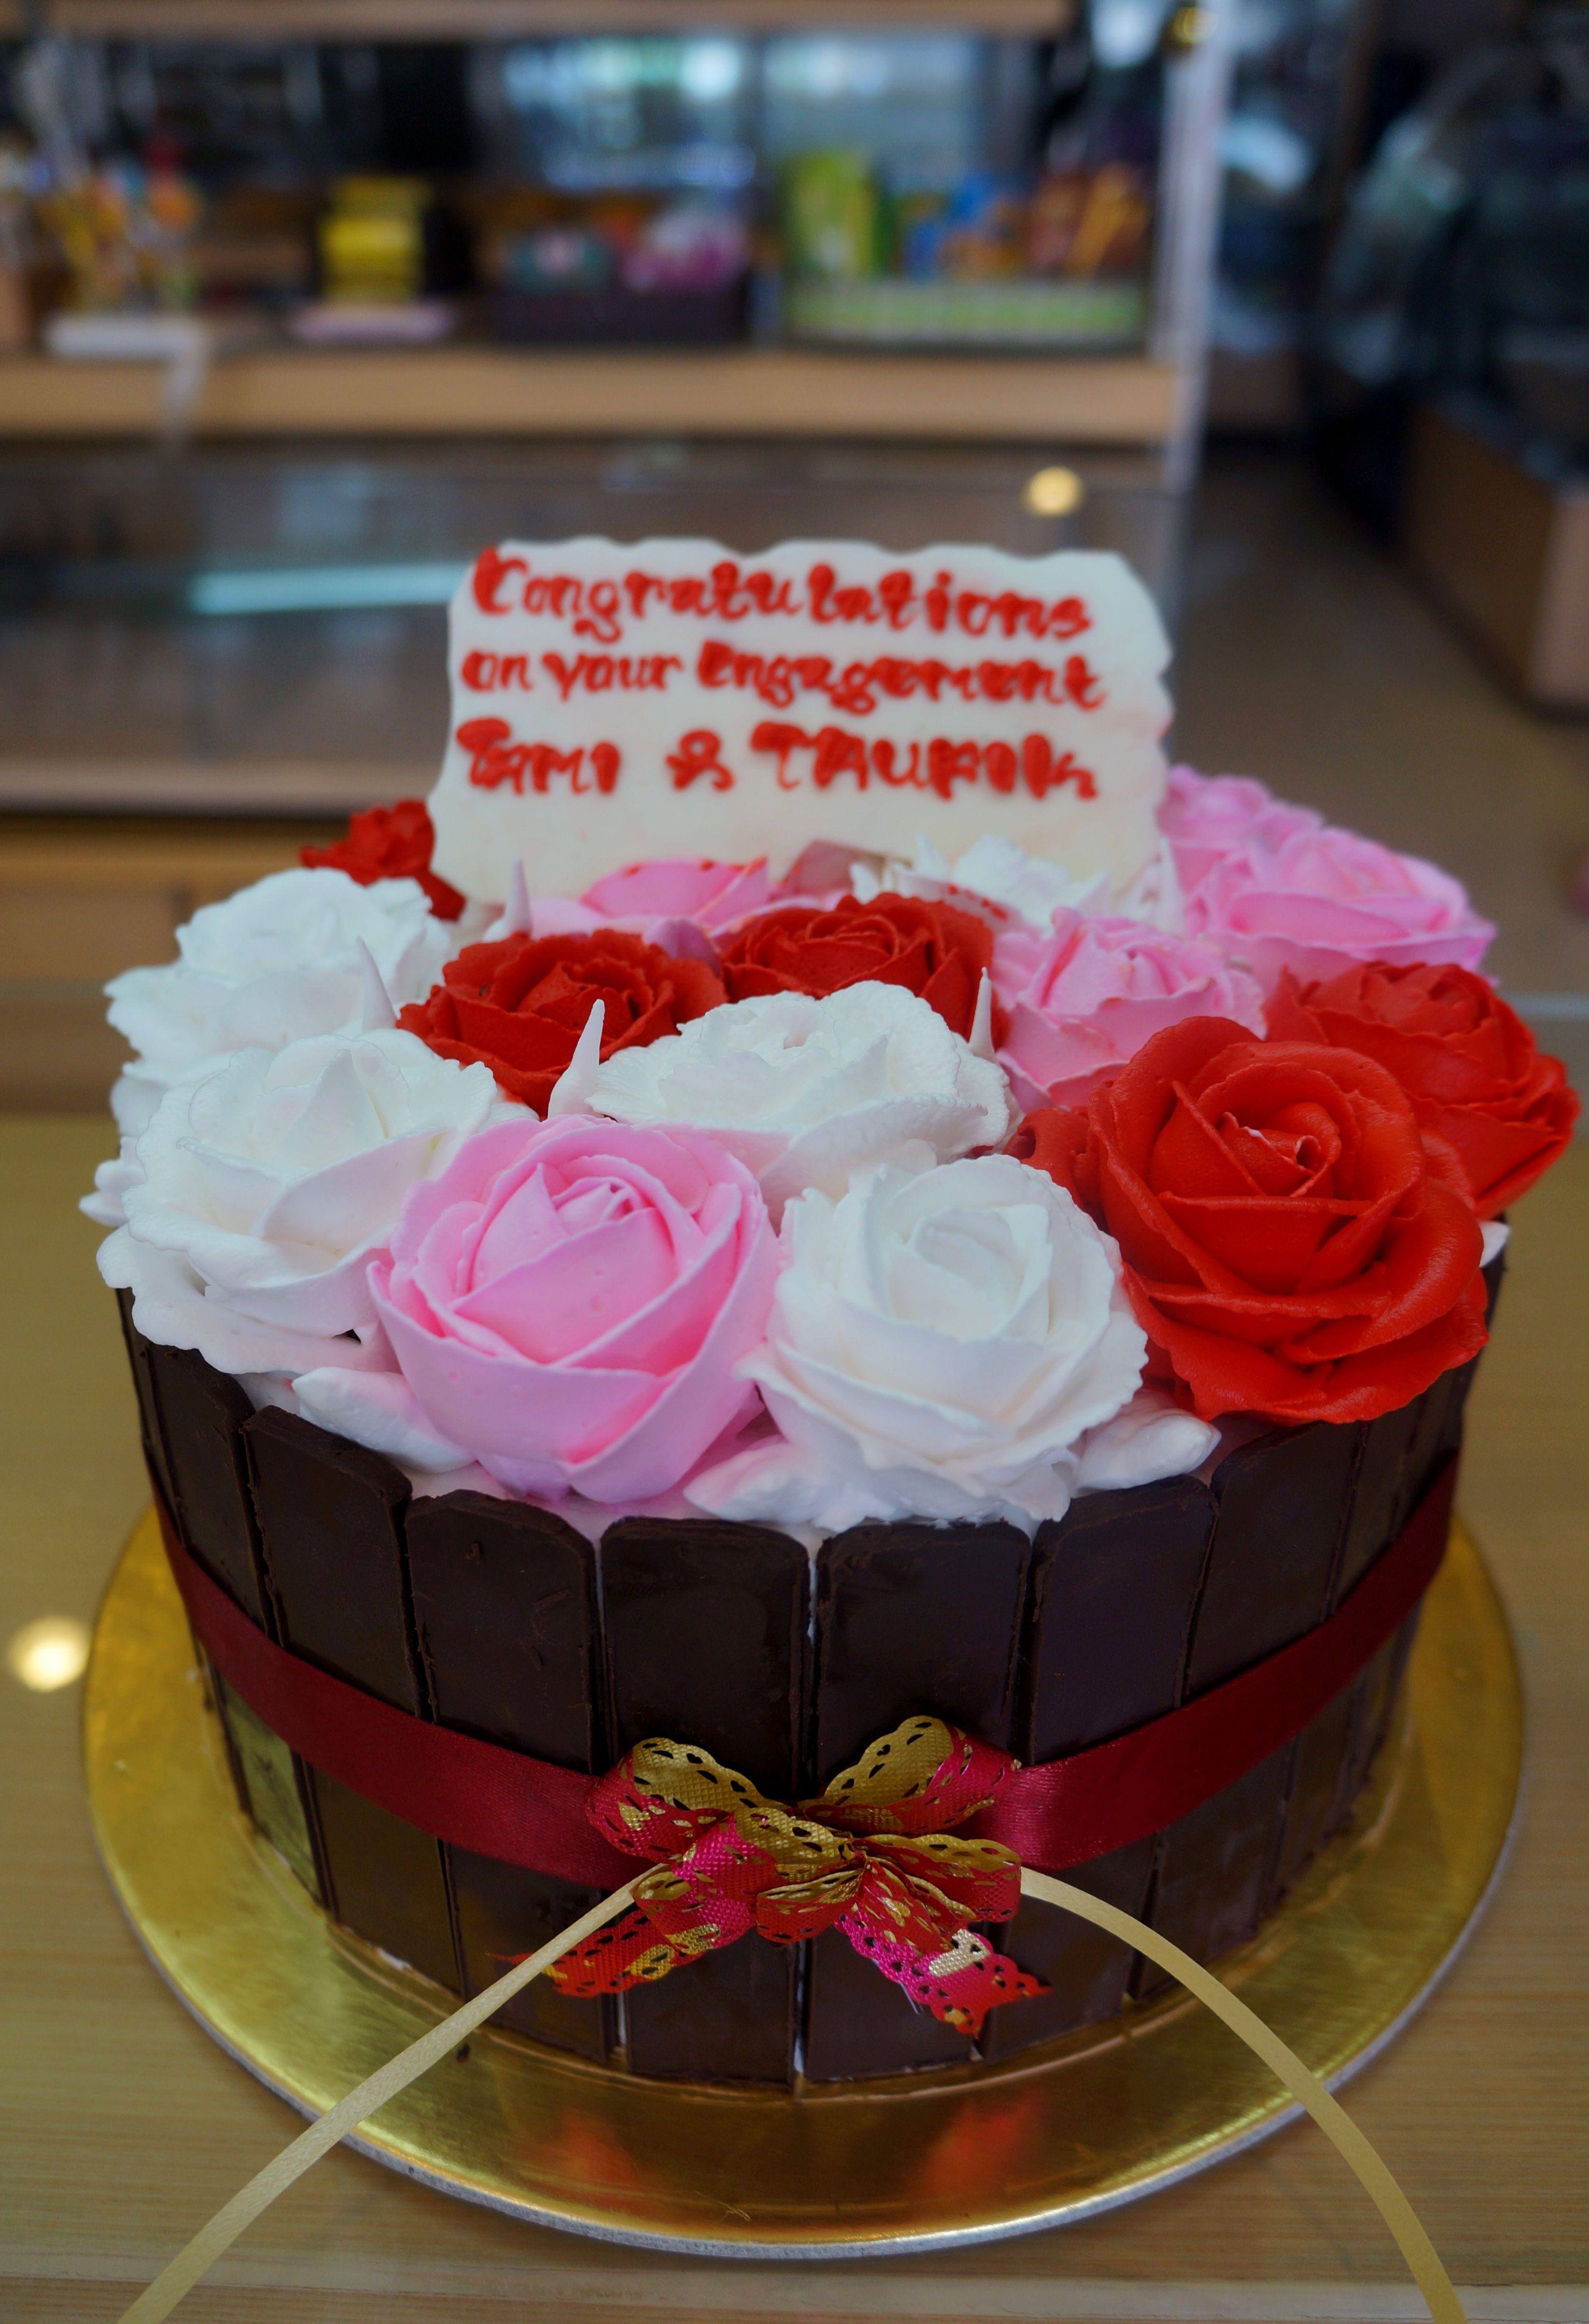 Birthday Cake Cirebon Cake Ulang Tahun Cirebon Kue Ulang Tahun Cirebon Custom Cake Cirebon Cake Karakter Cirebon Strawberry Del Kue Ulang Tahun Ulang Tahun